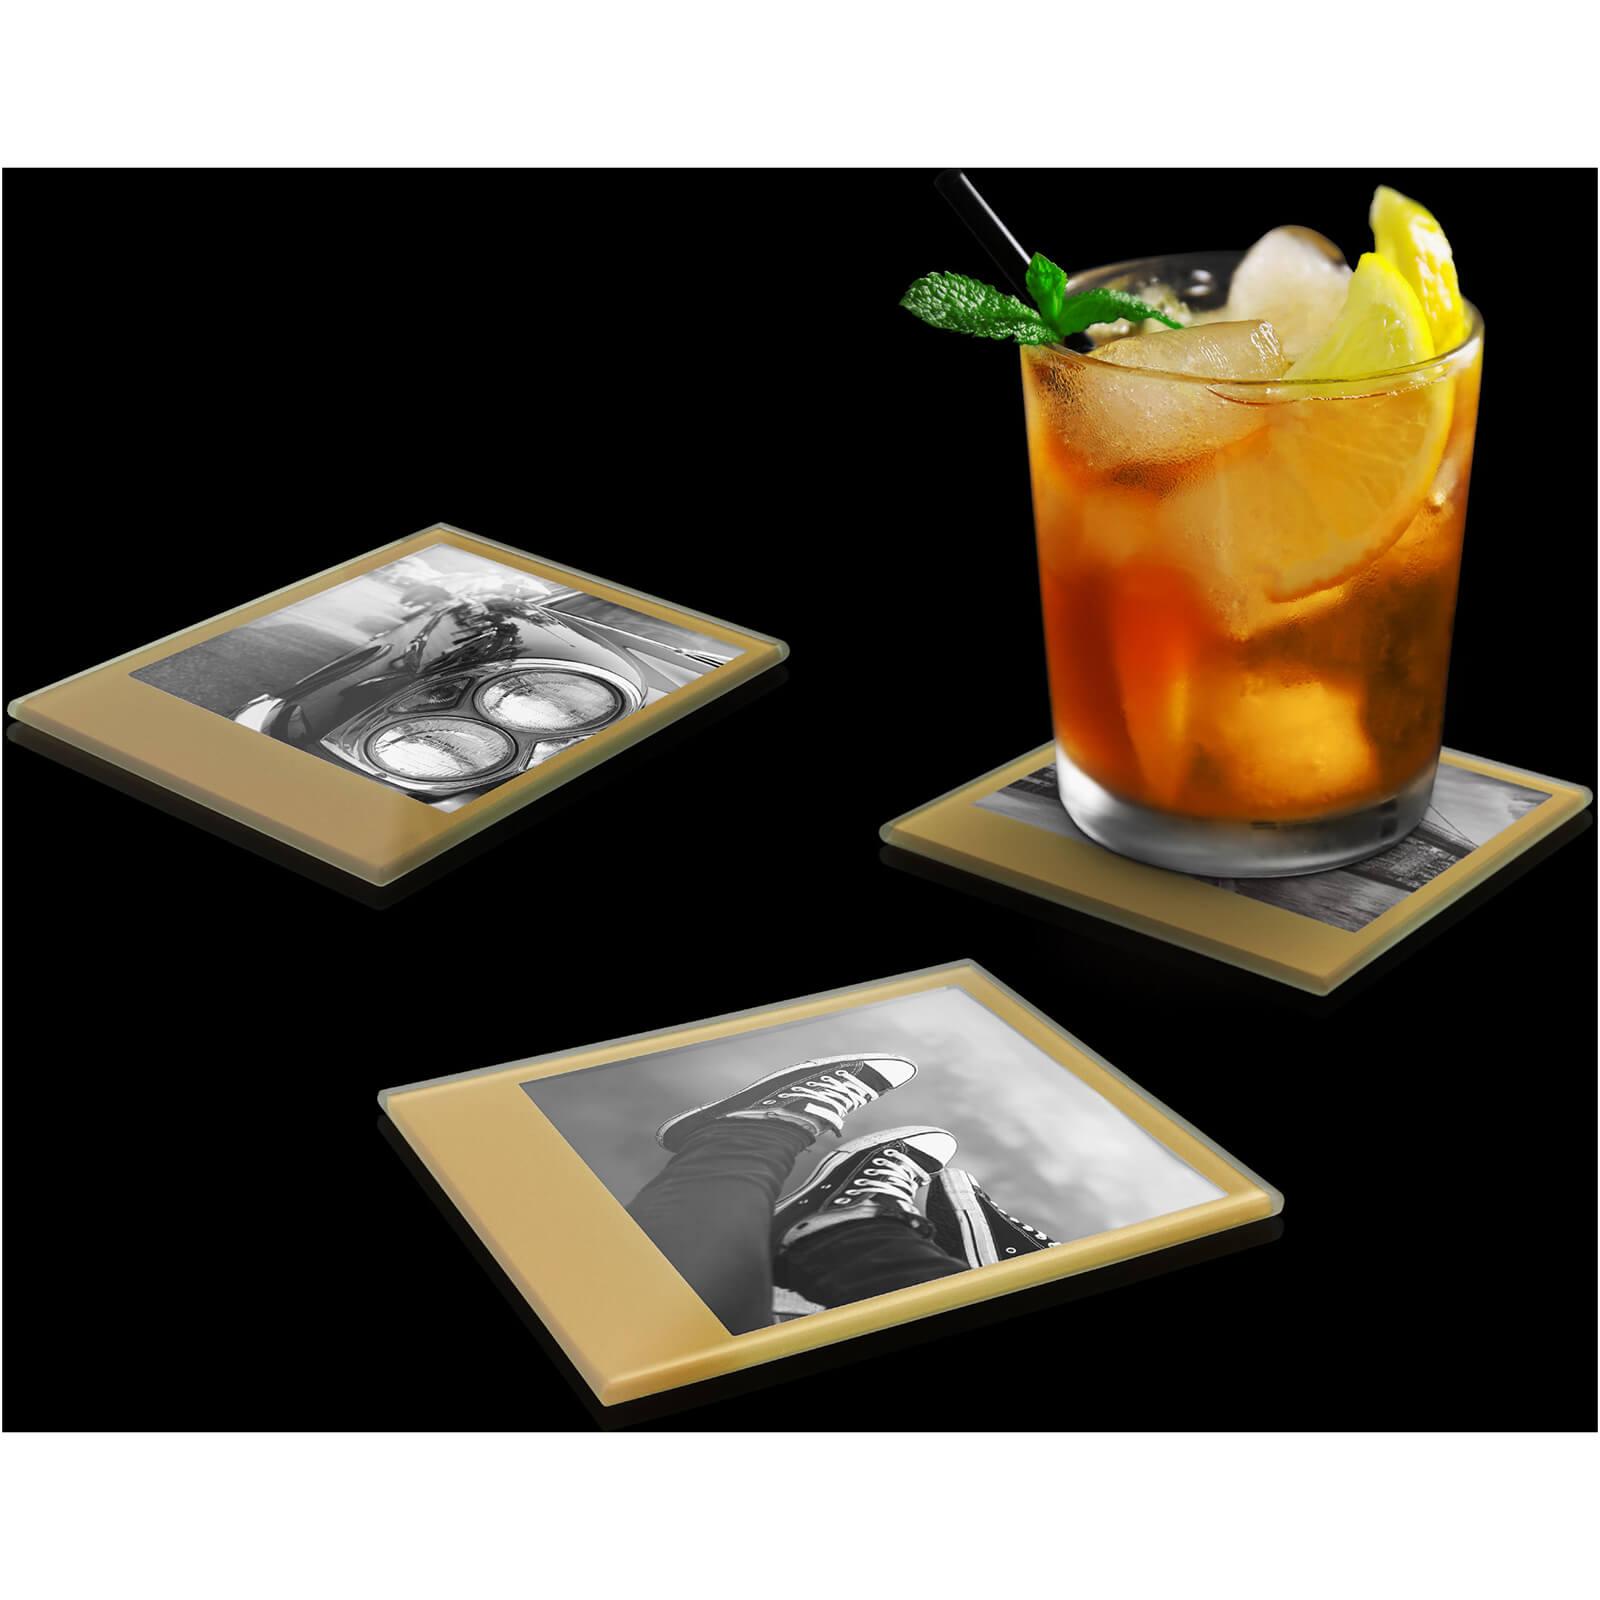 Mustard Photo Coasters – Retro Gold